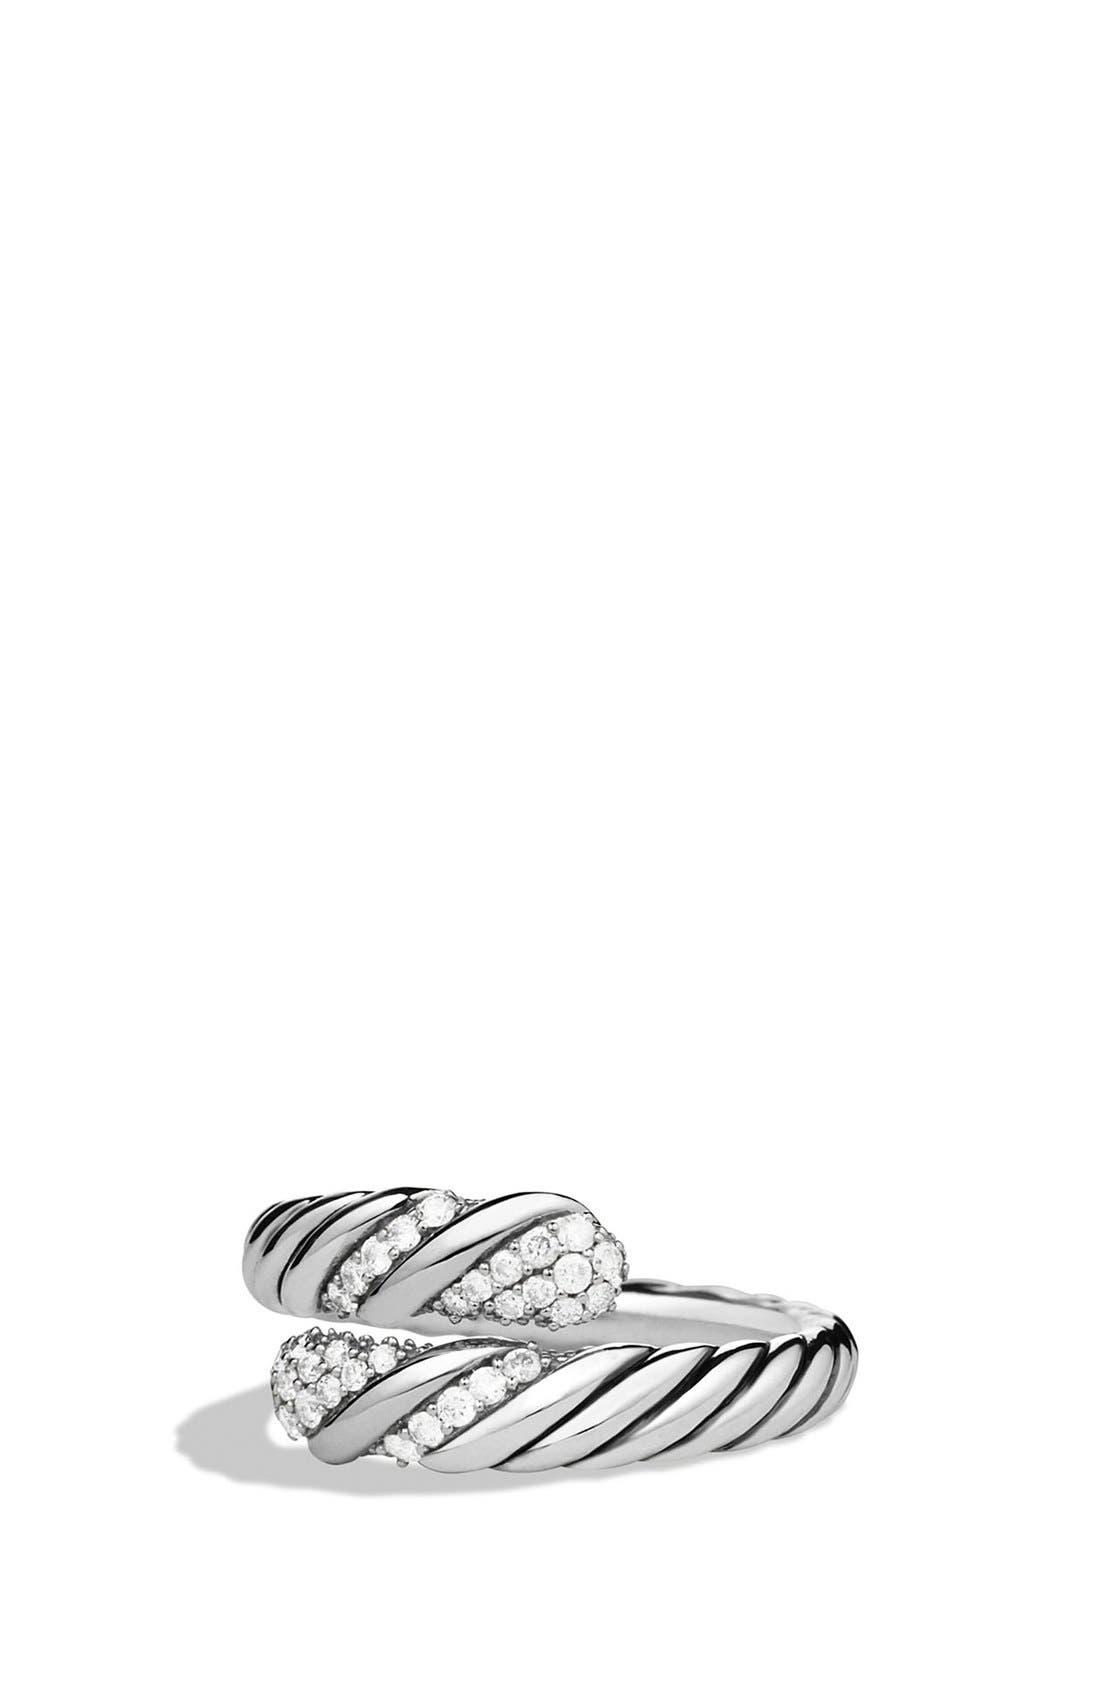 Main Image - David Yurman 'Willow' Open Single Row Ring with Diamonds